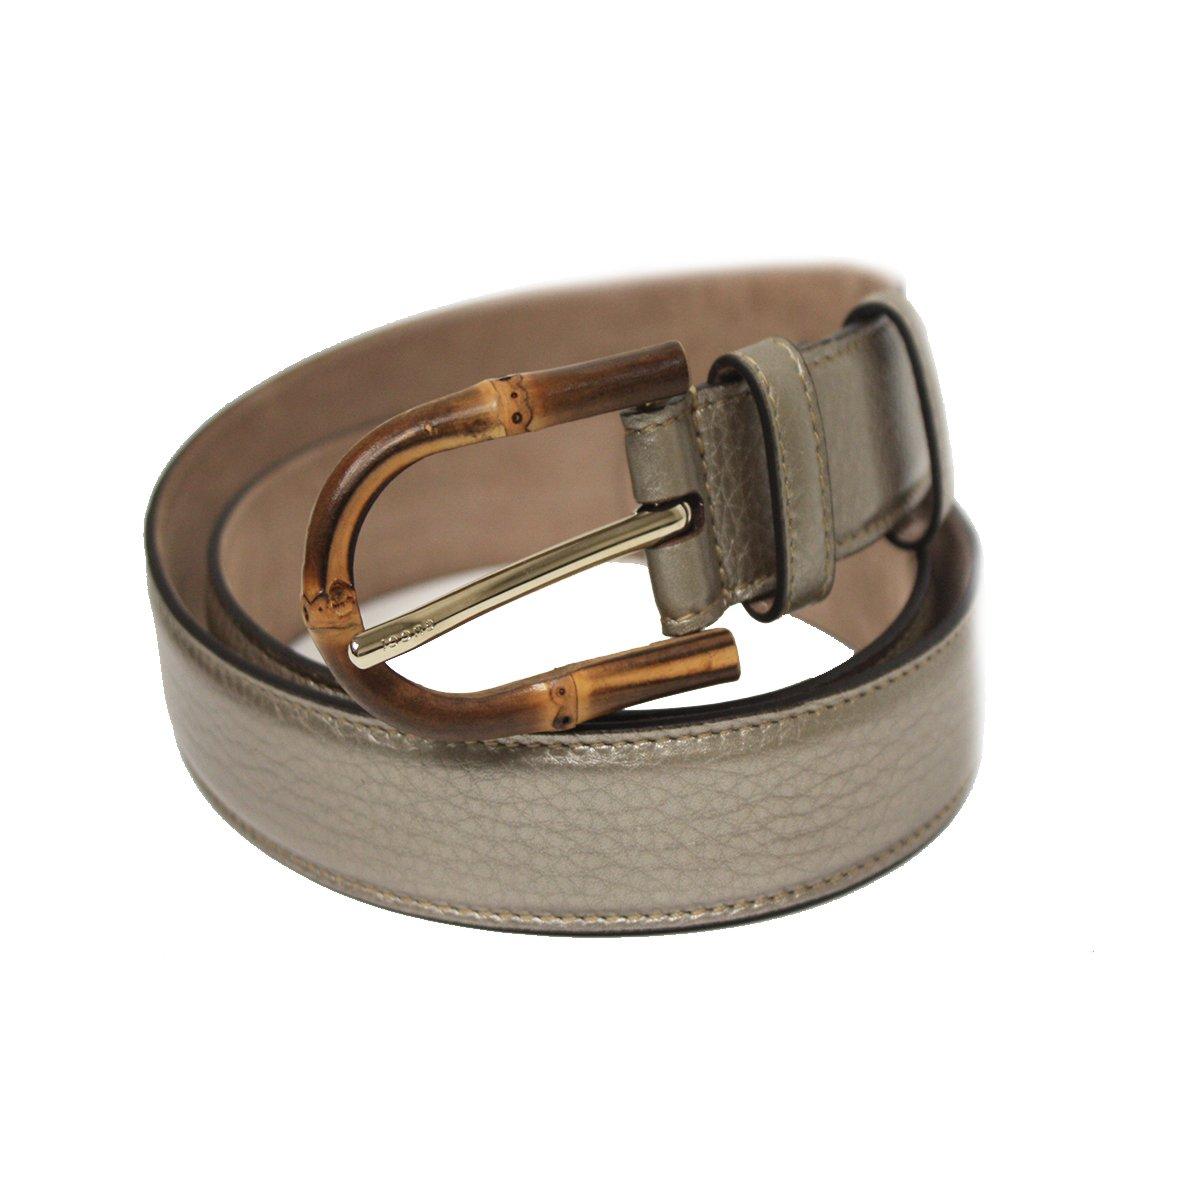 Gucci Women's Bamboo Buckle Leather Belt 322954 (90/36, Golden Beige)